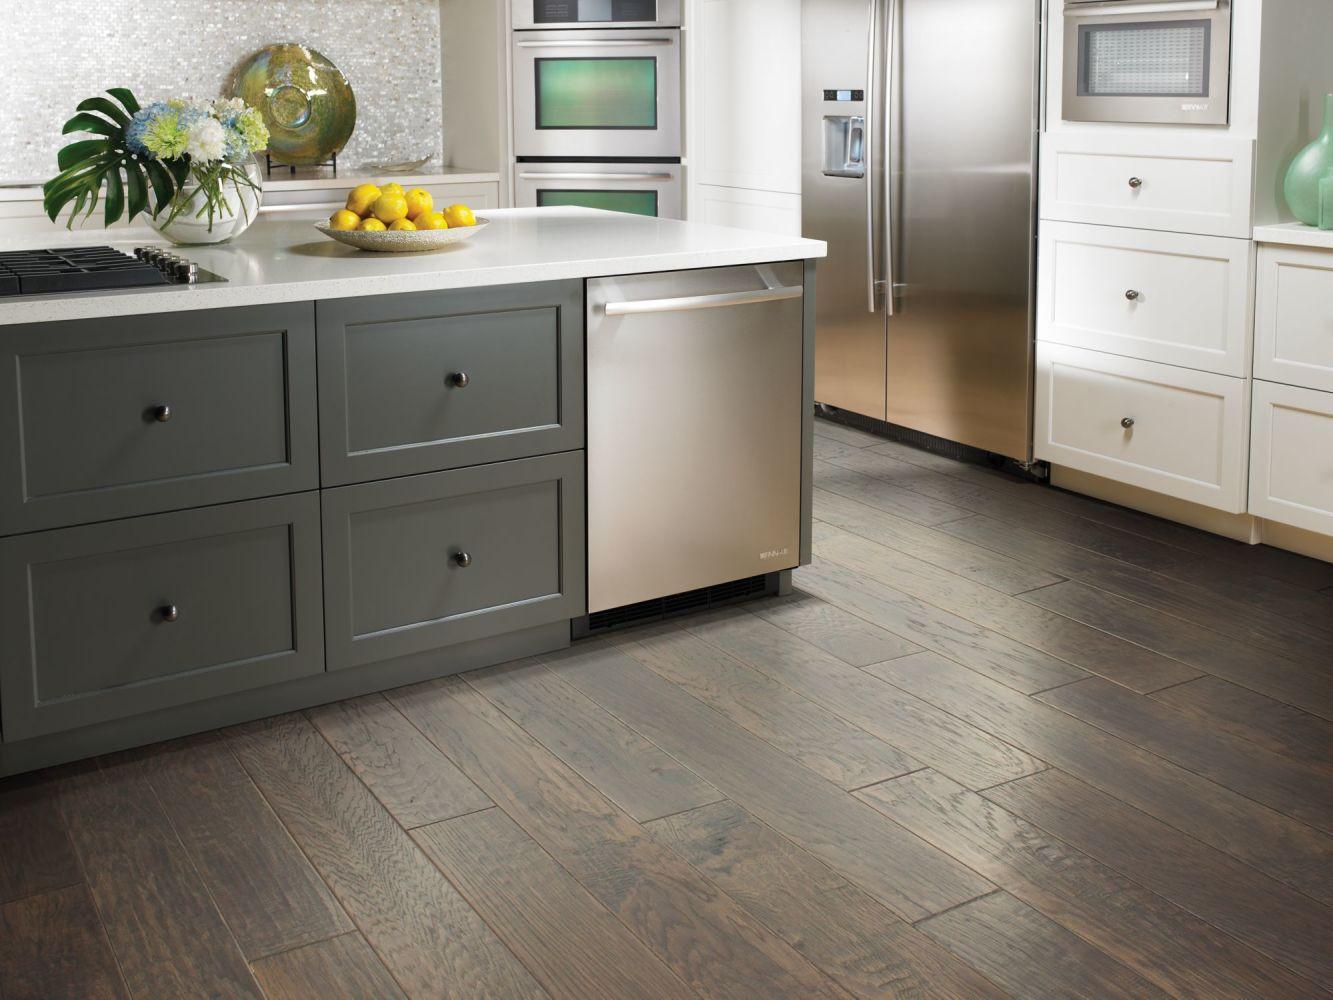 Shaw Floors Home Fn Gold Hardwood Leesburg 2 -6 3/8″ Peppercorn 05003_HW607